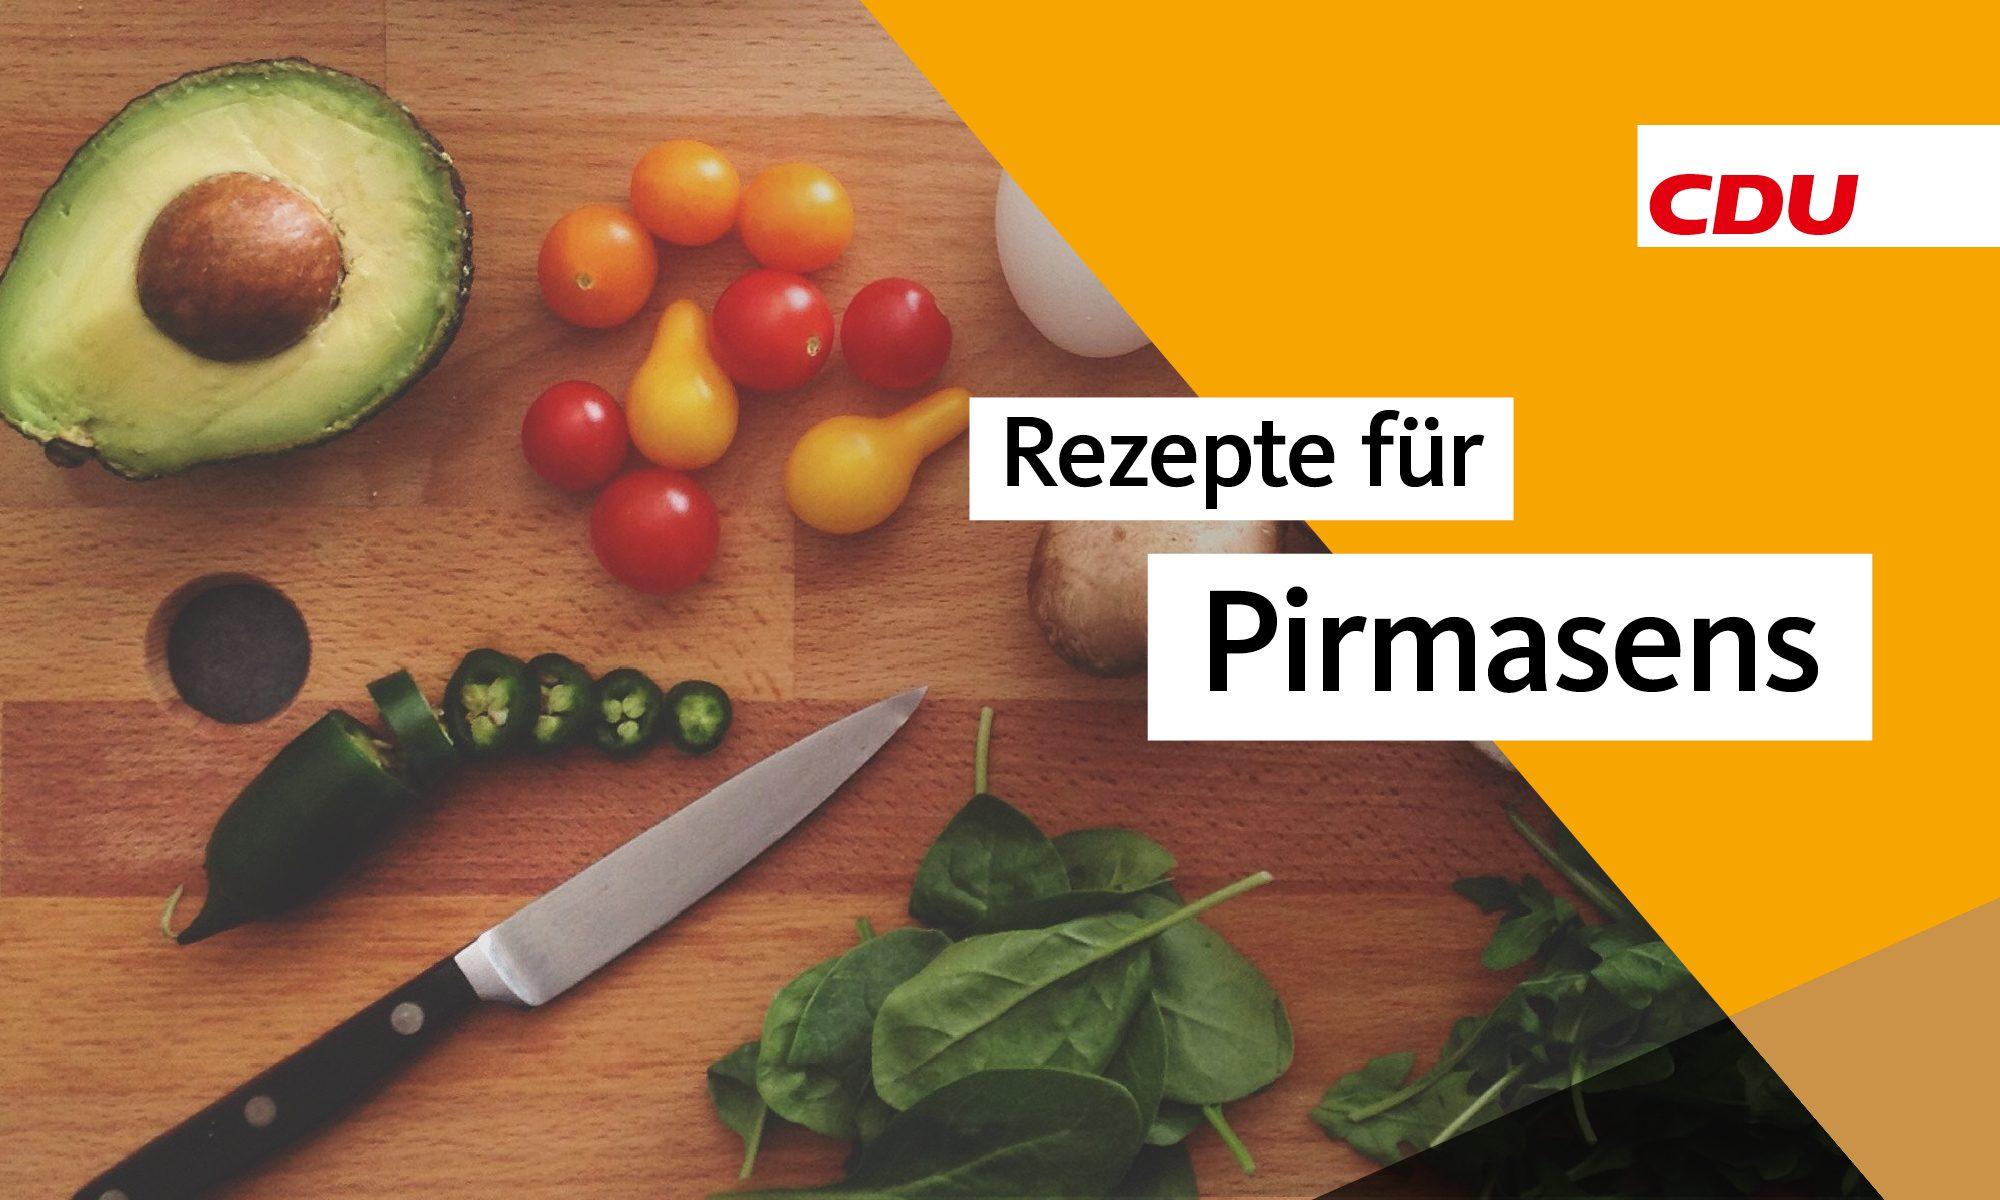 CDU KV Pirmasens